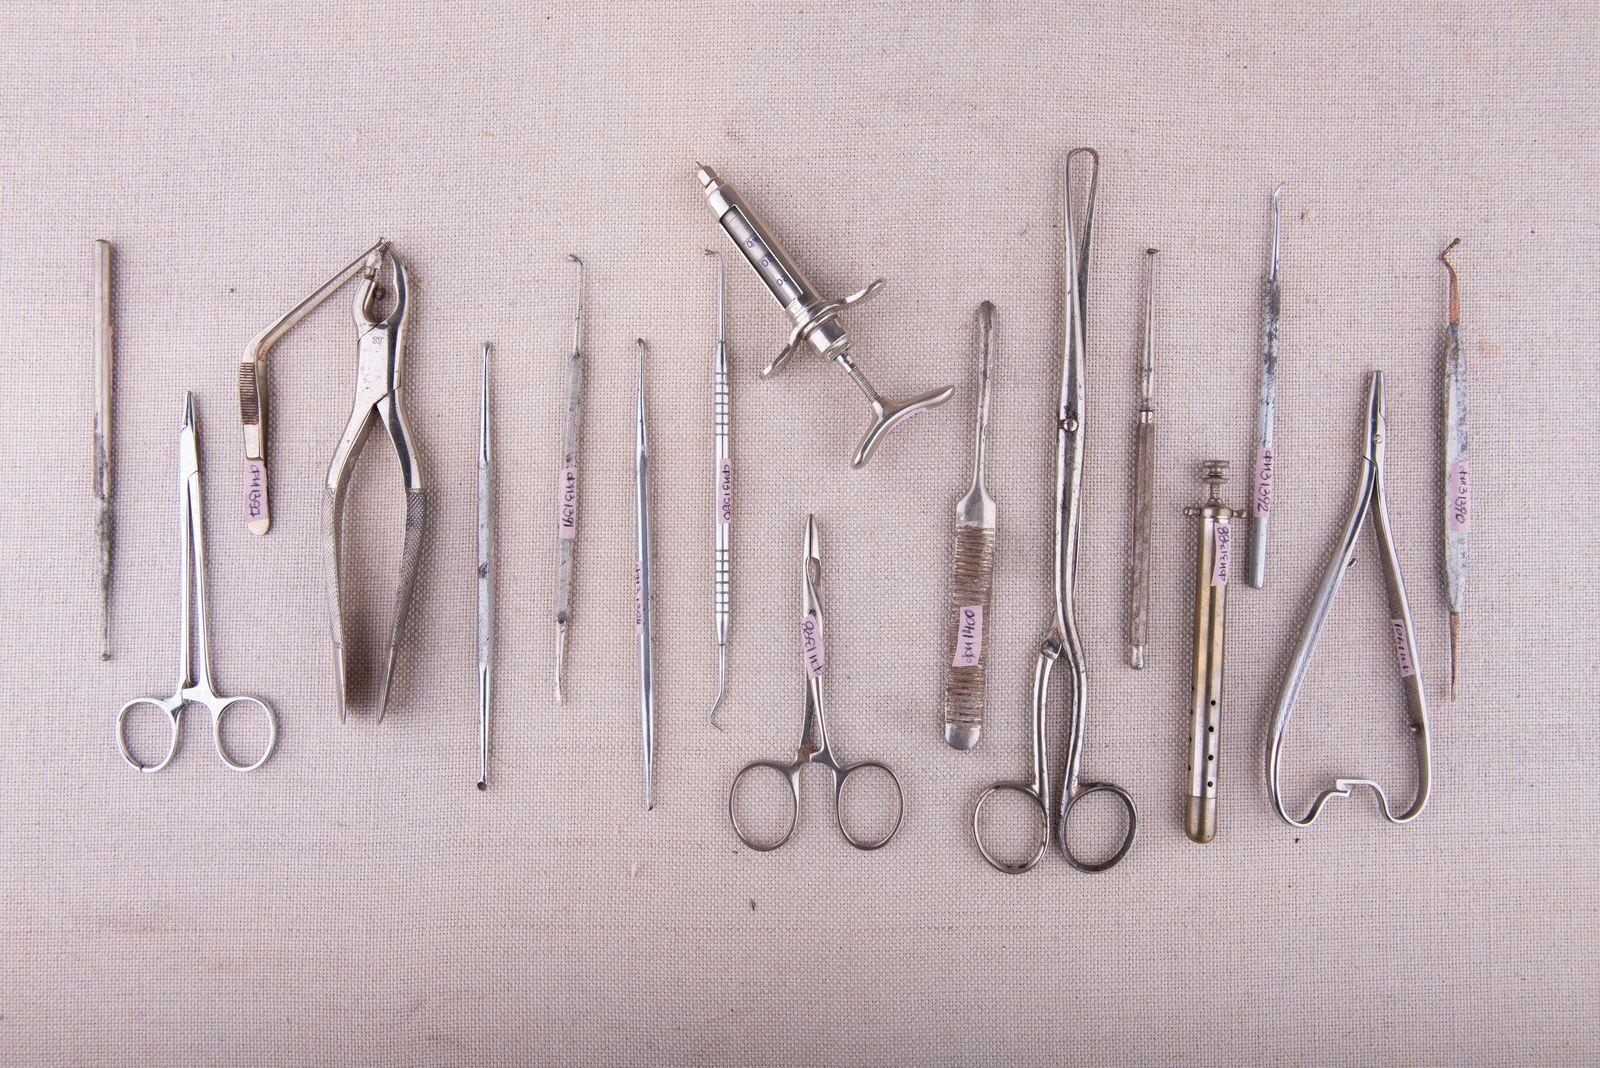 Muzei243_ Личен стоматологичен инструментариум за преглед и хирургични манипулации